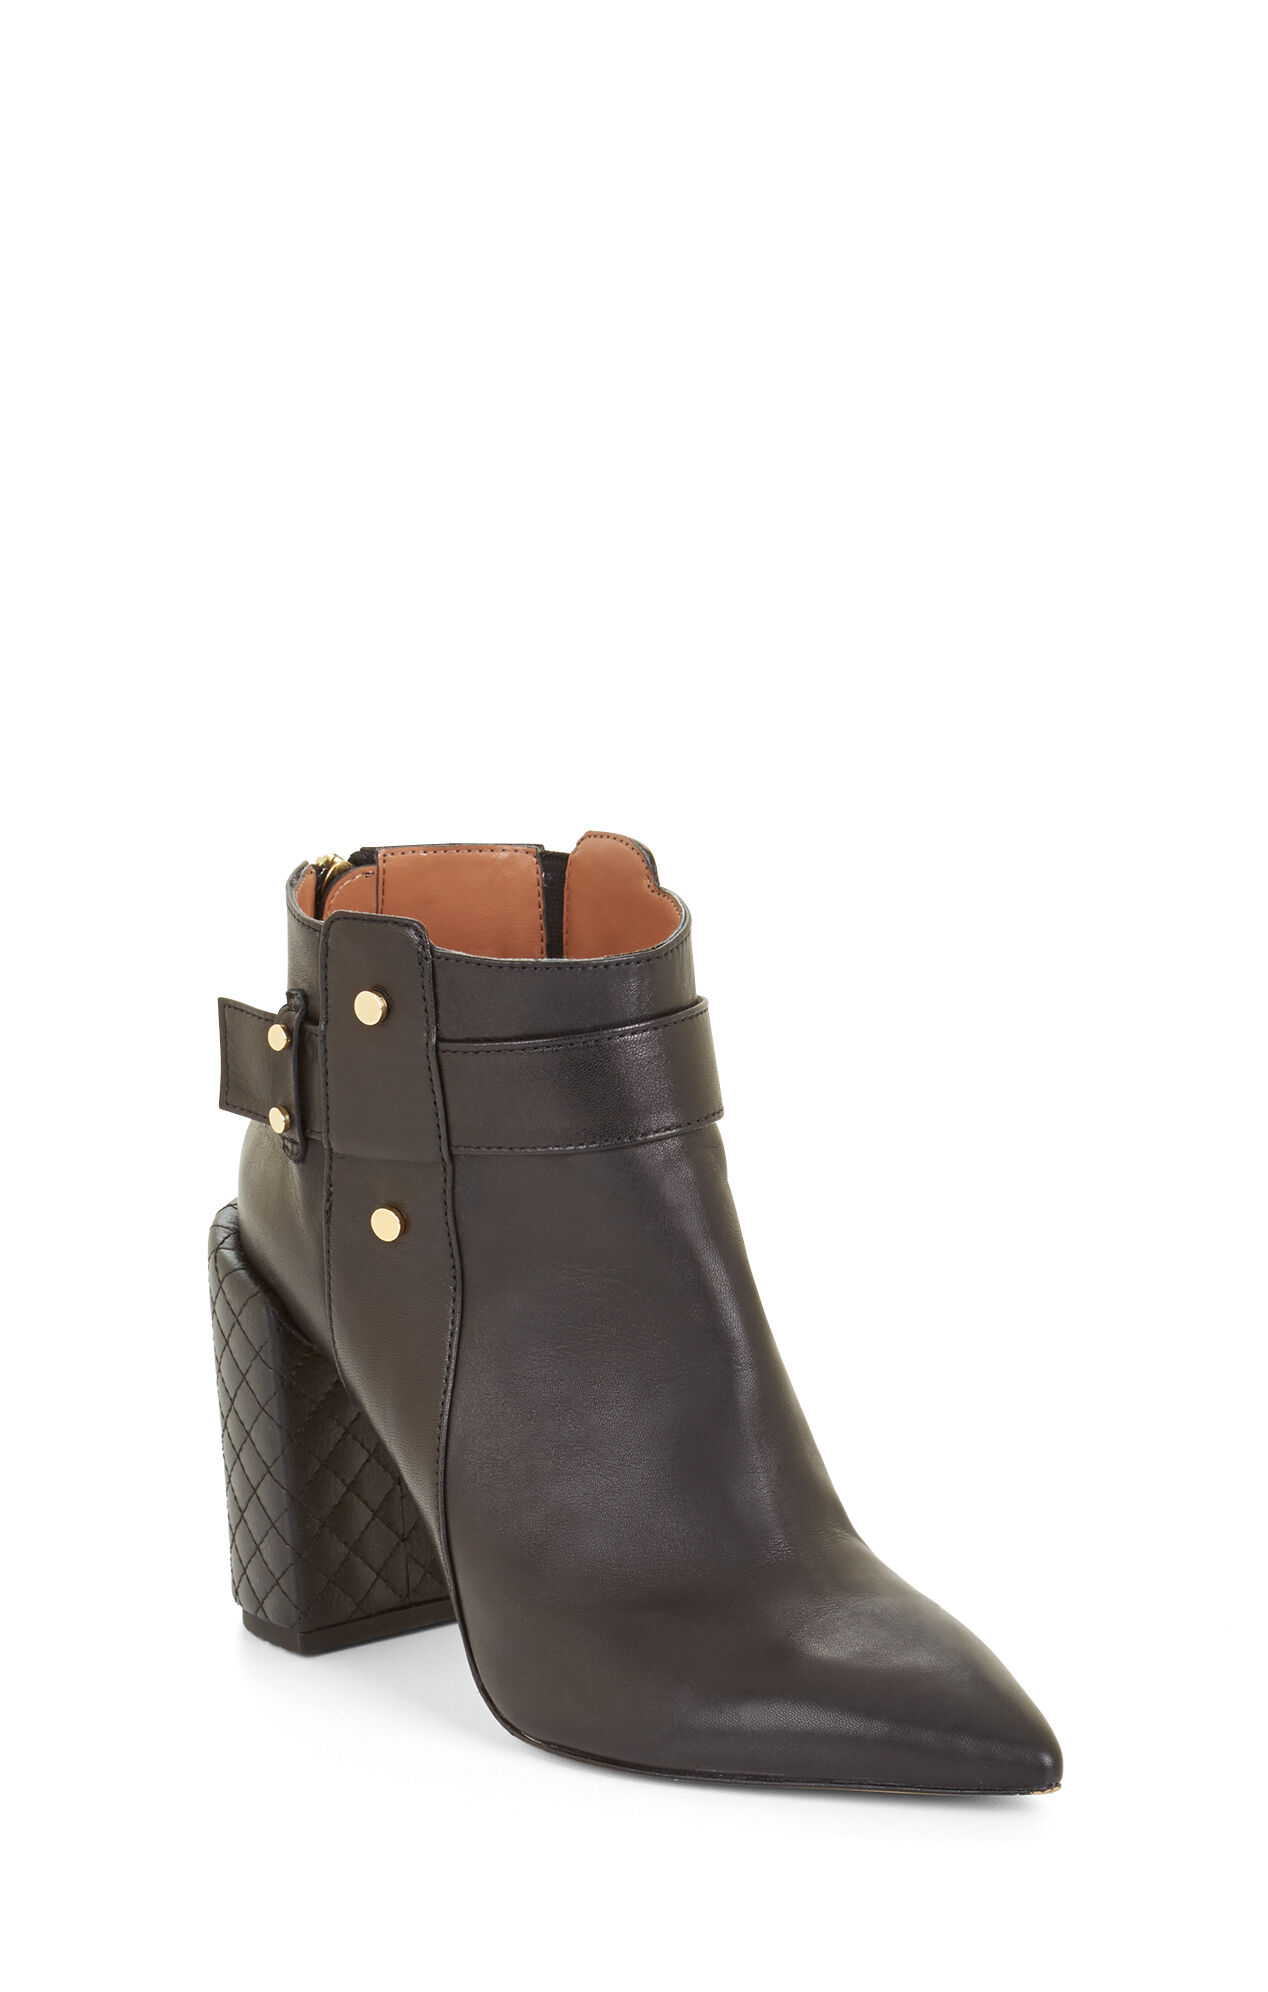 Jarod High-Heel Leather Bootie